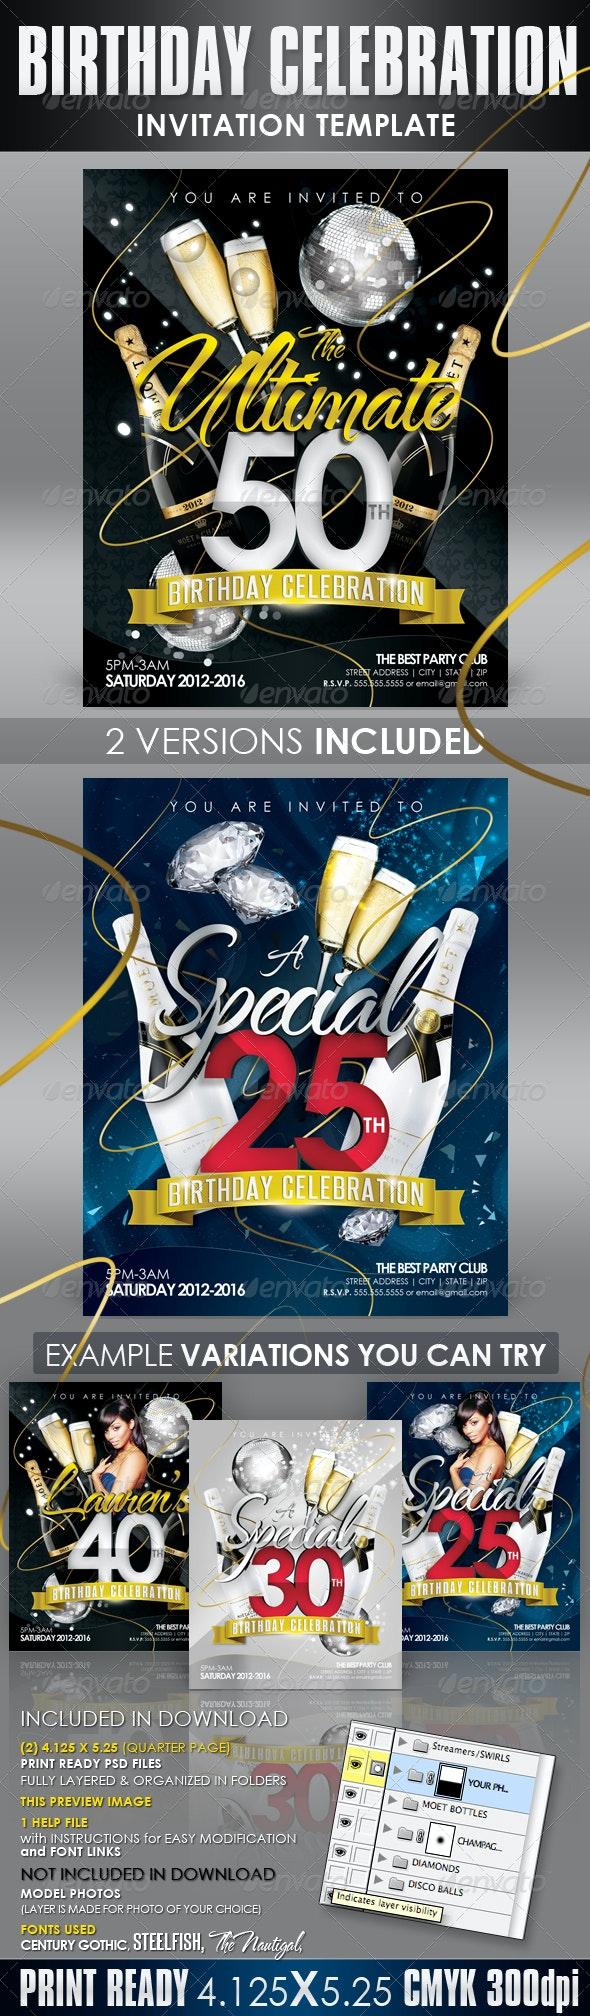 Birthday Invitation Templates - Club Flyer Style - Invitations Cards & Invites